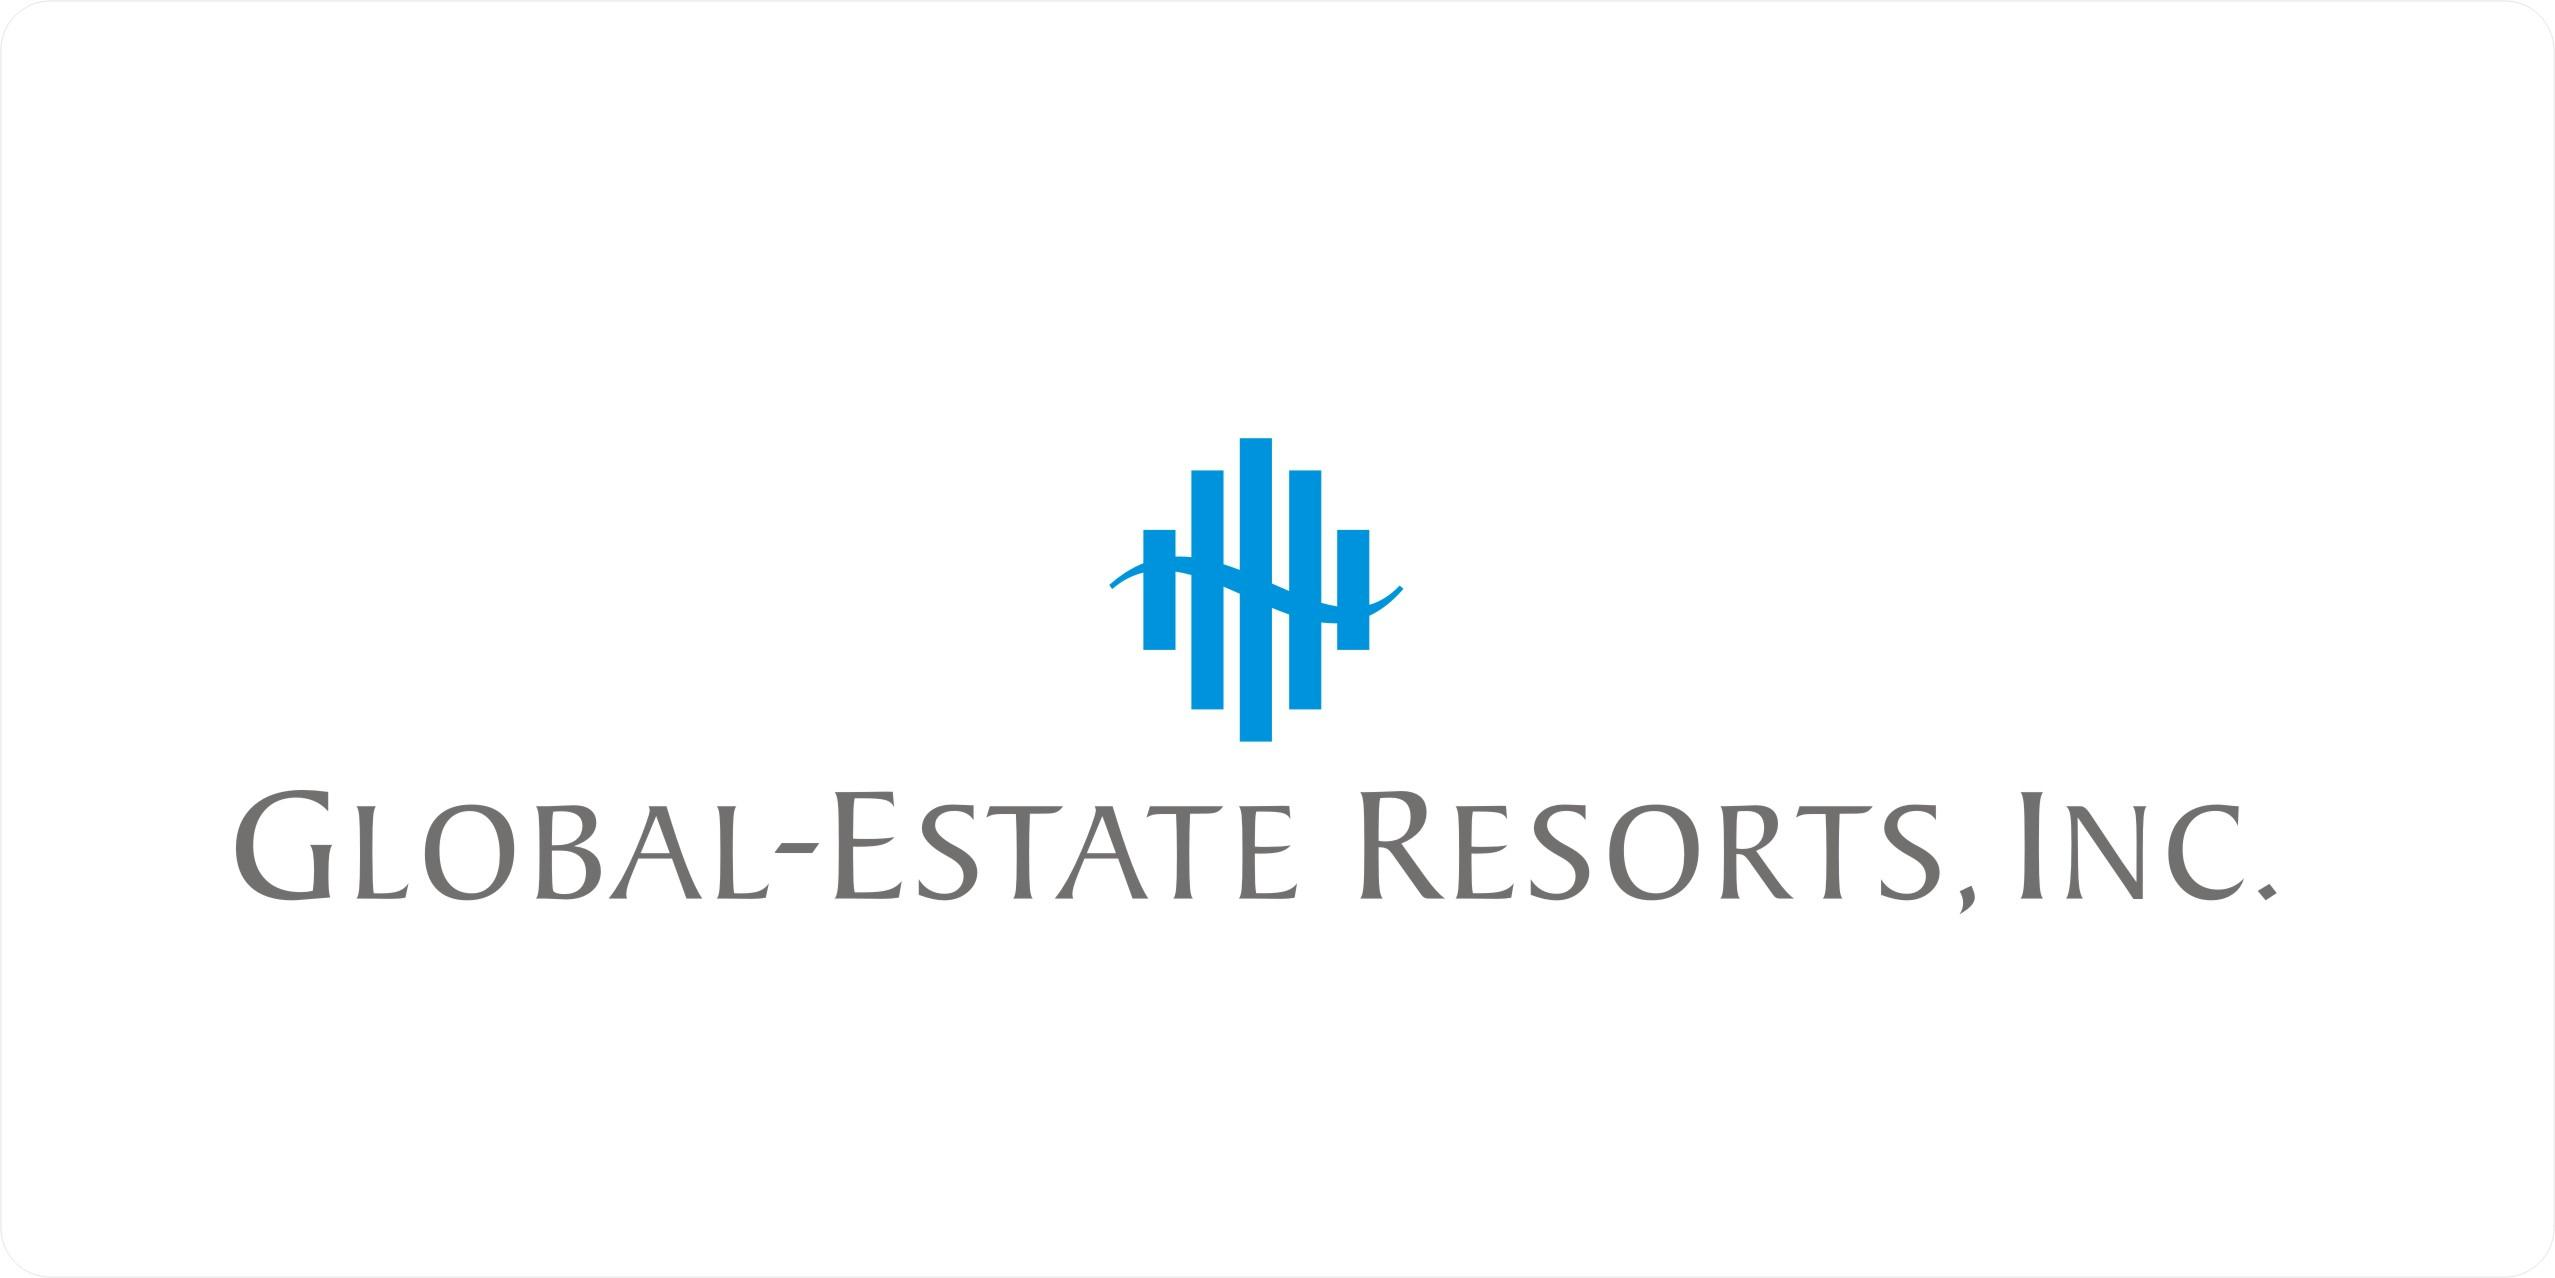 Global-Estate Resorts, Inc (Subsidiary of Megaworld Corp.)